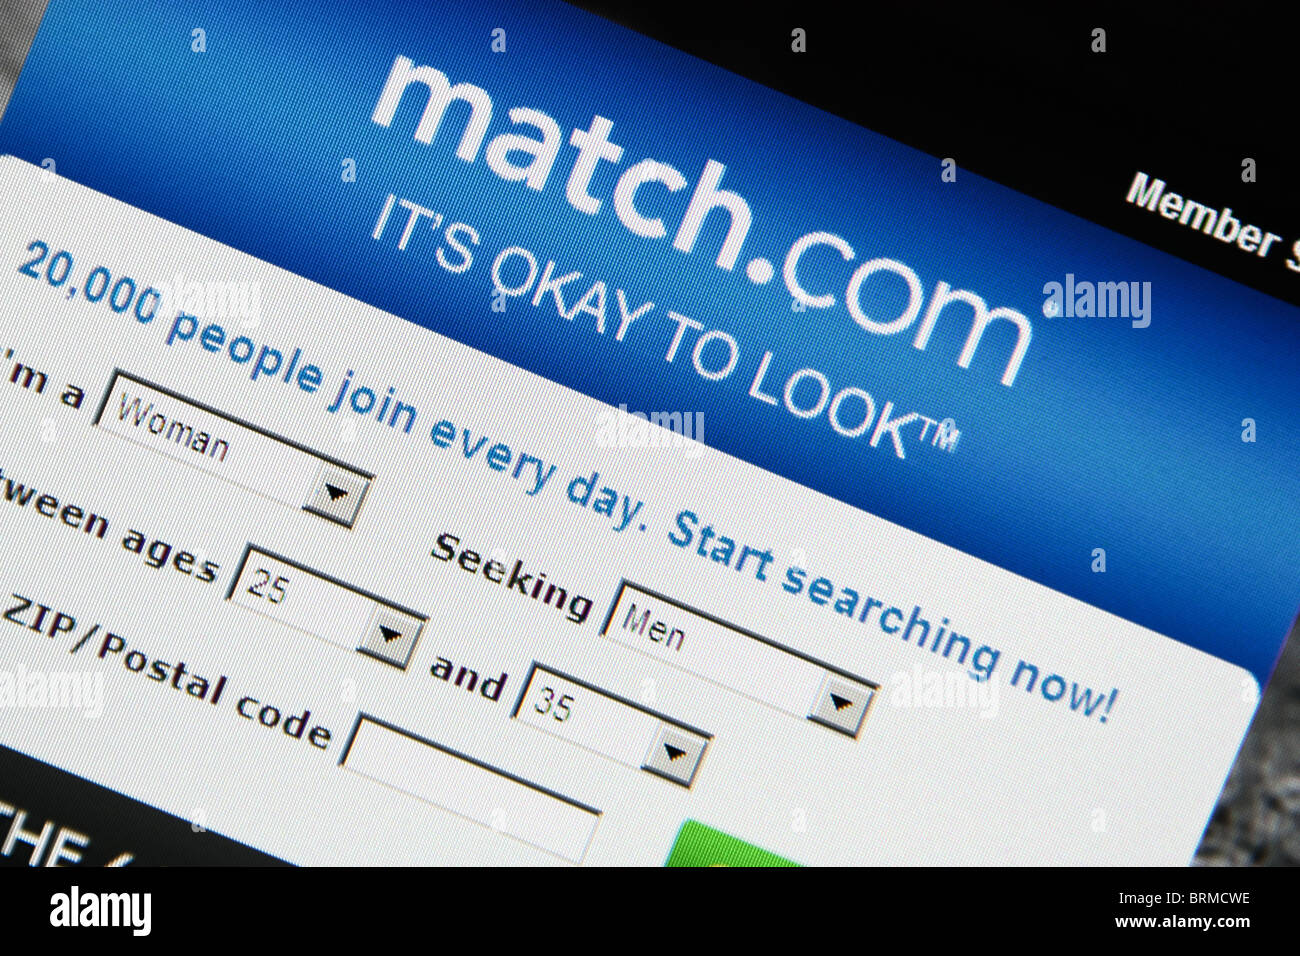 online dating match.com - Stock Image